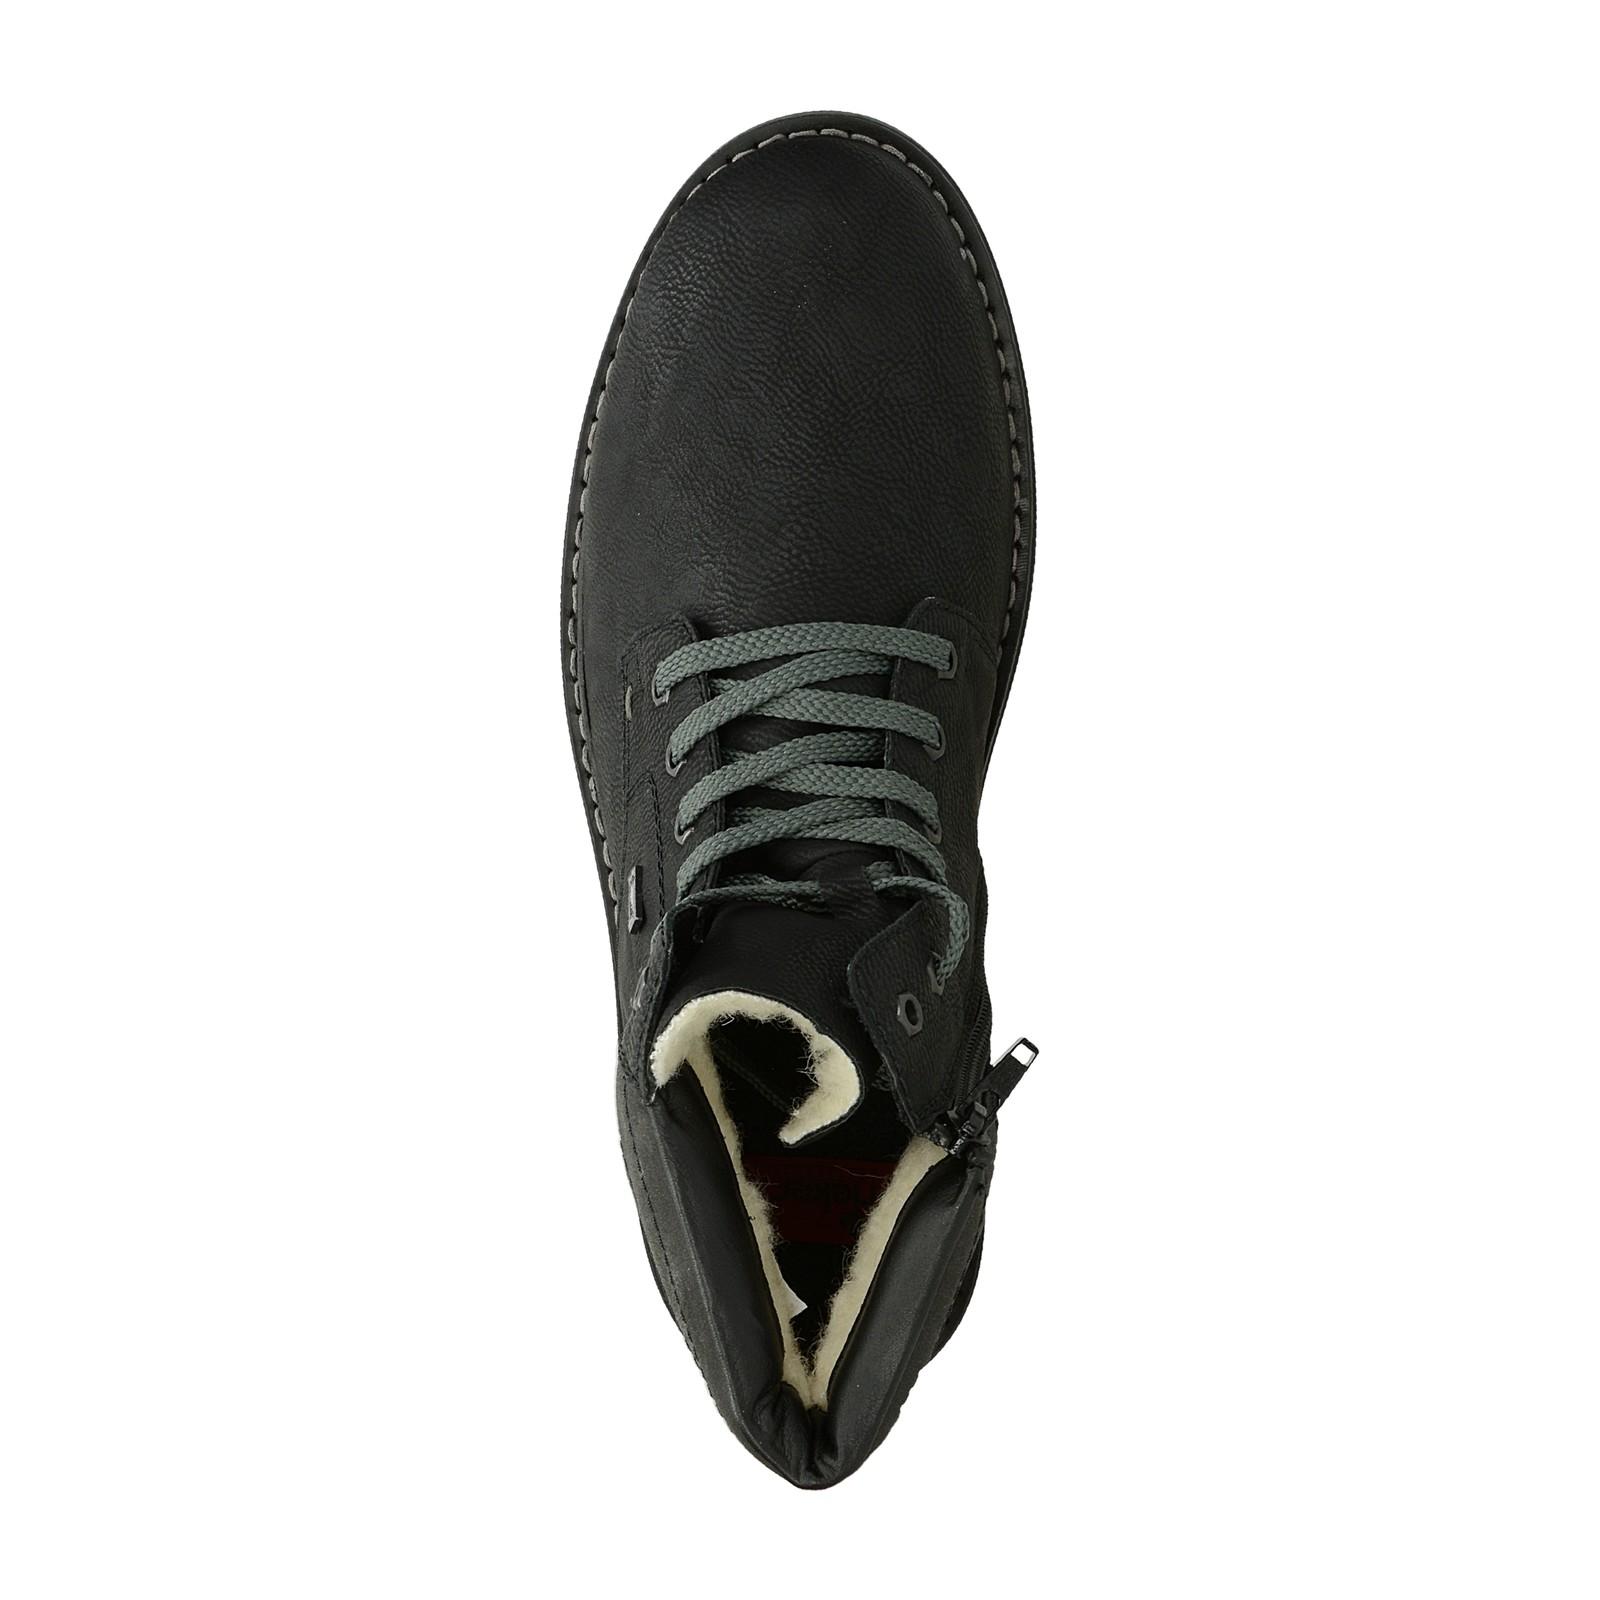 Rieker pánske čižmy na zips - čierne